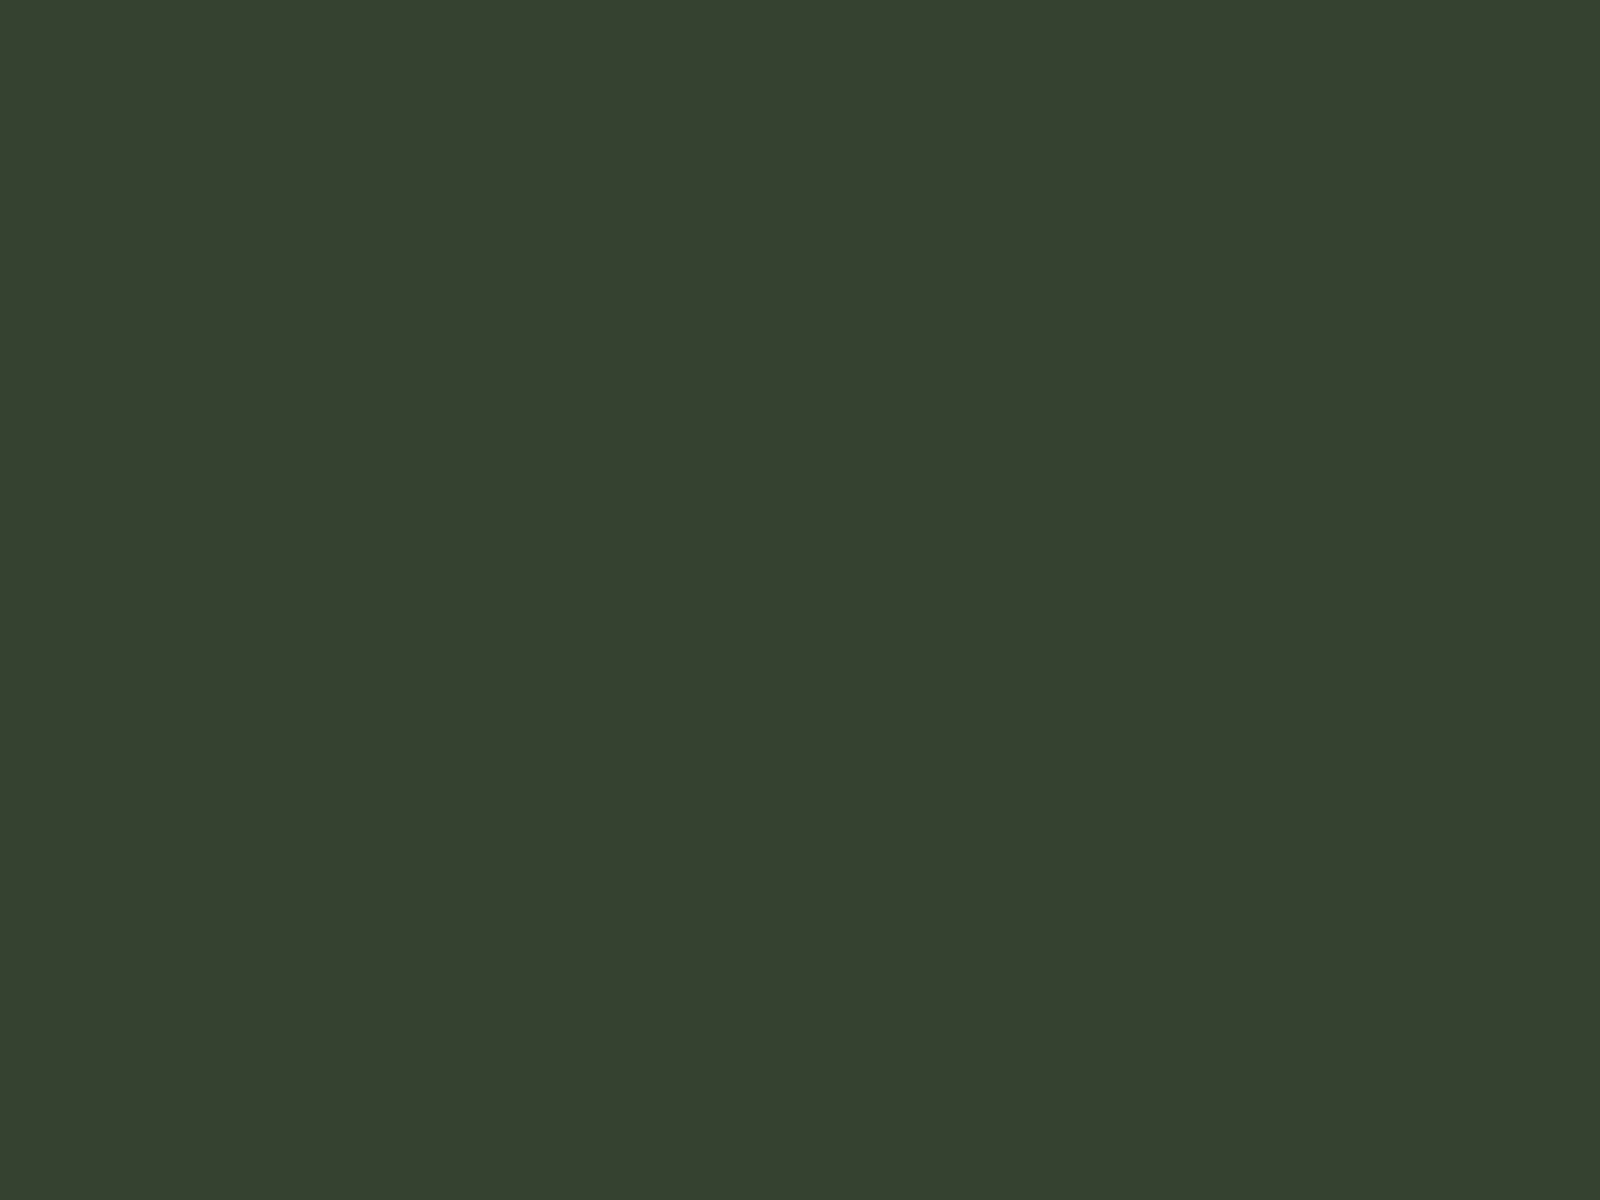 1600x1200 Kombu Green Solid Color Background